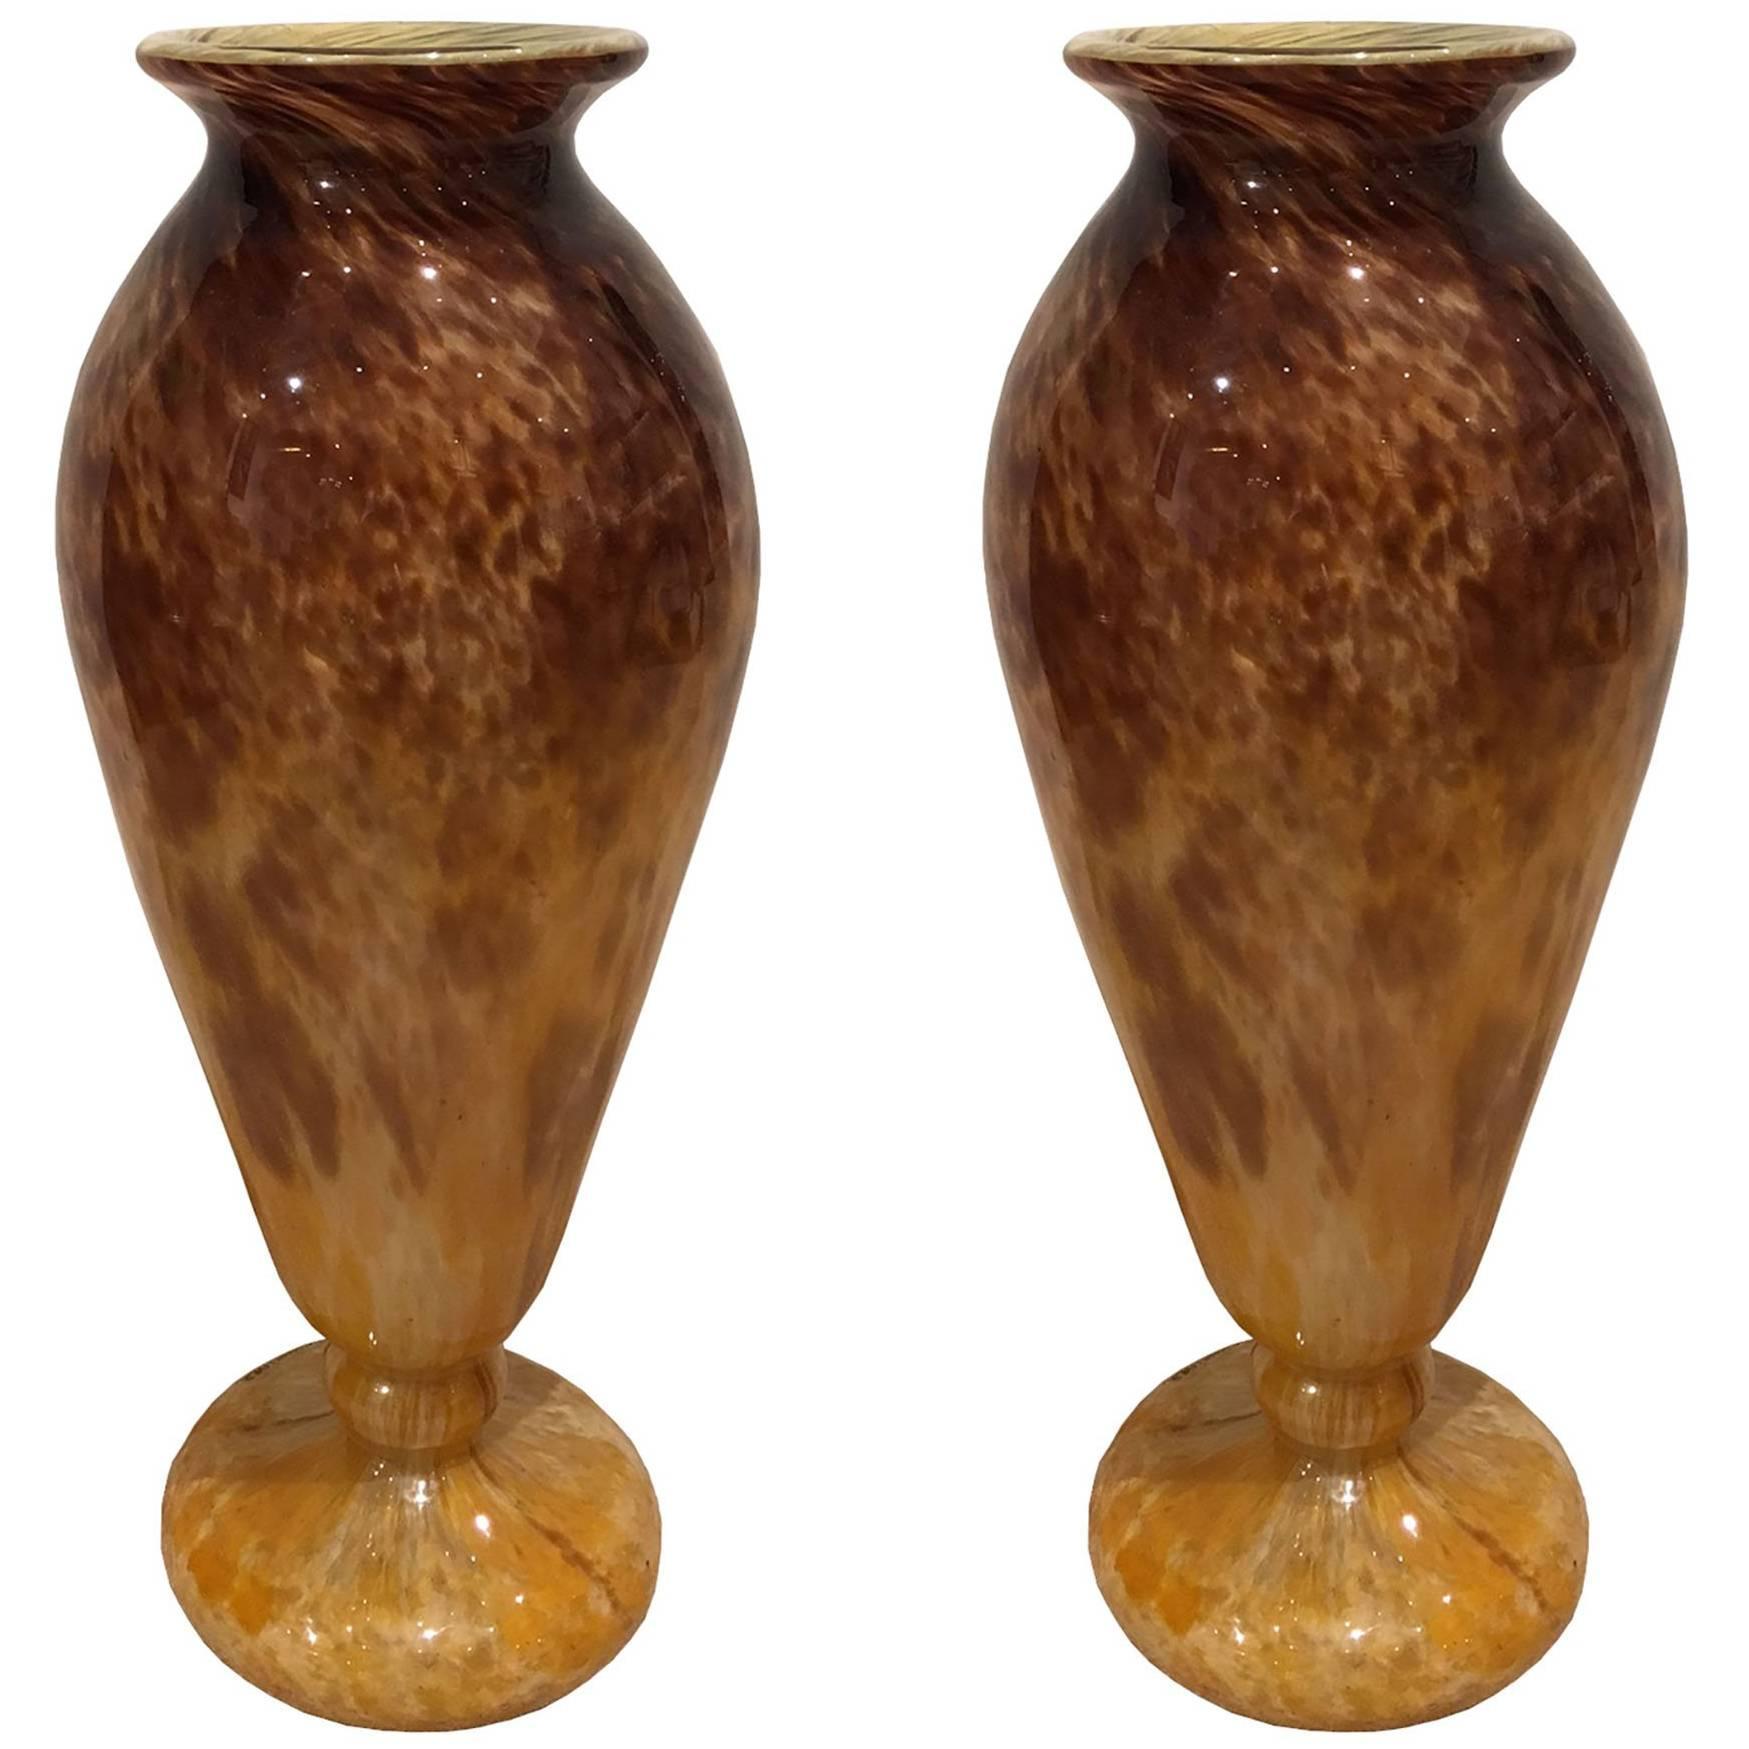 Pair of French Art Nouveau Schneider Blown Glass Vases